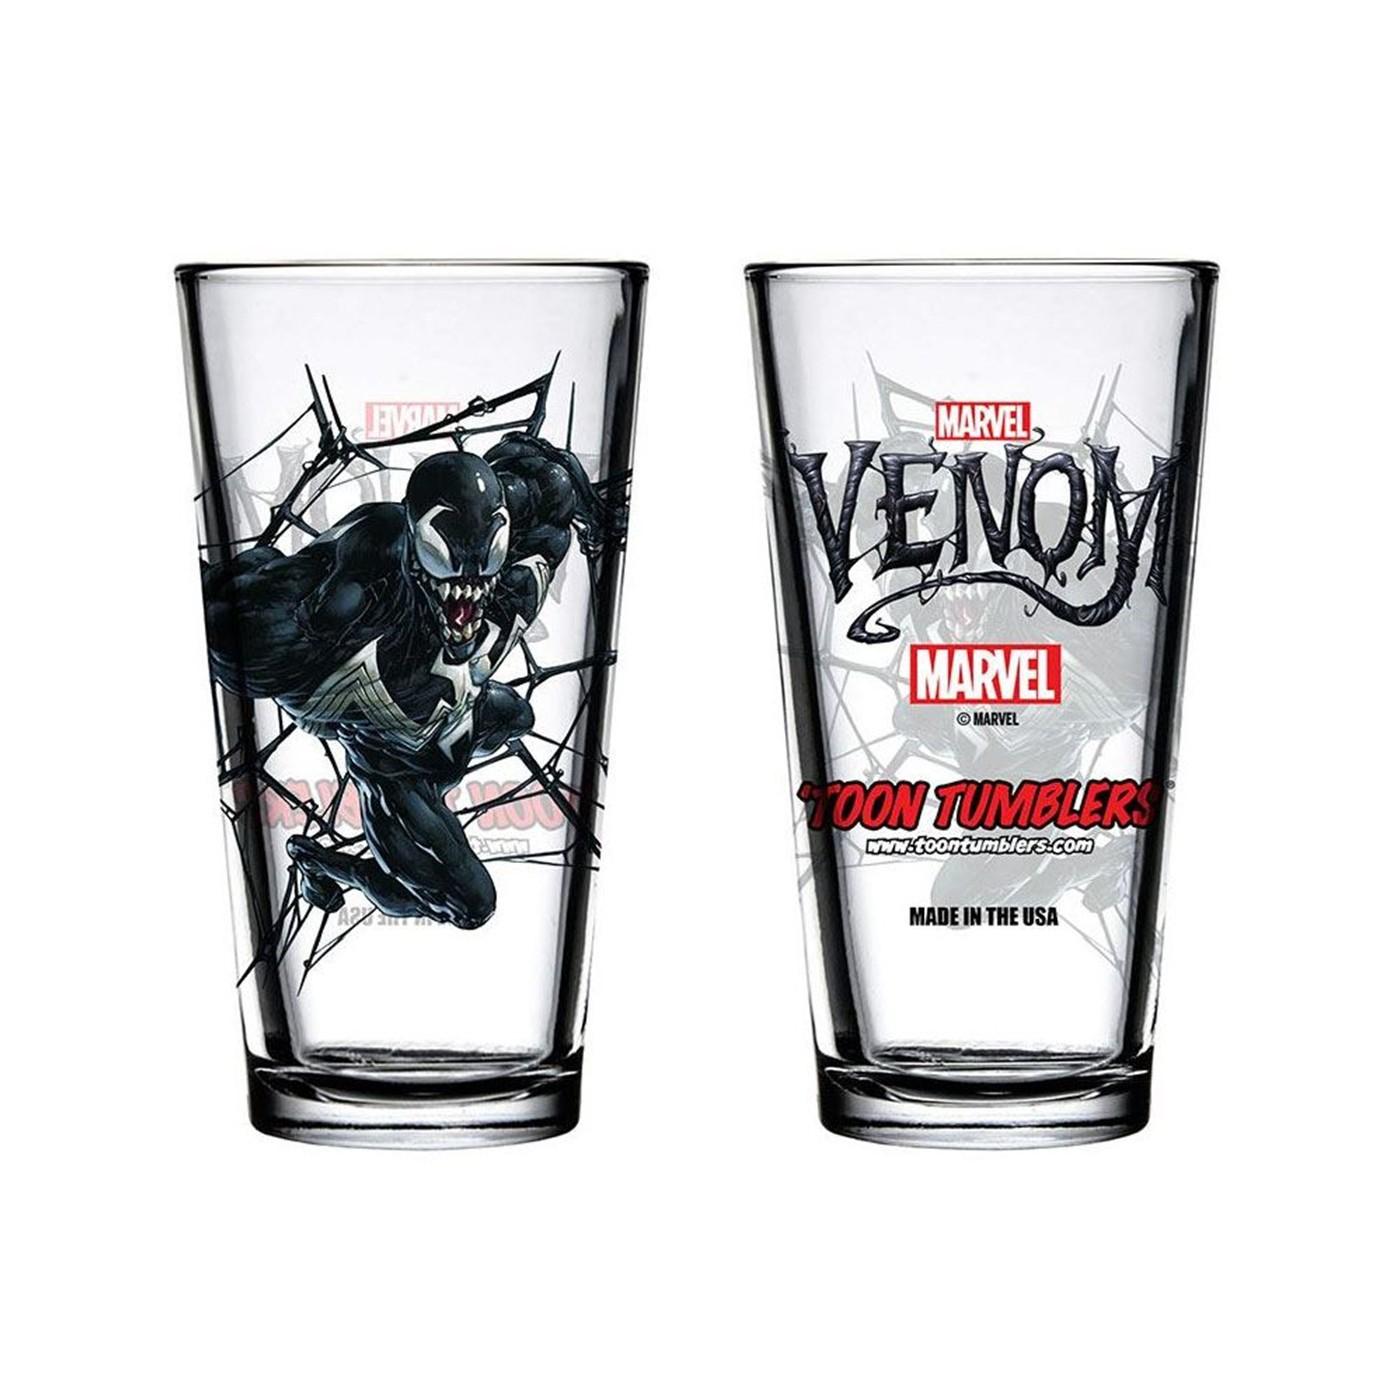 Venom Symbiote Pint Glass